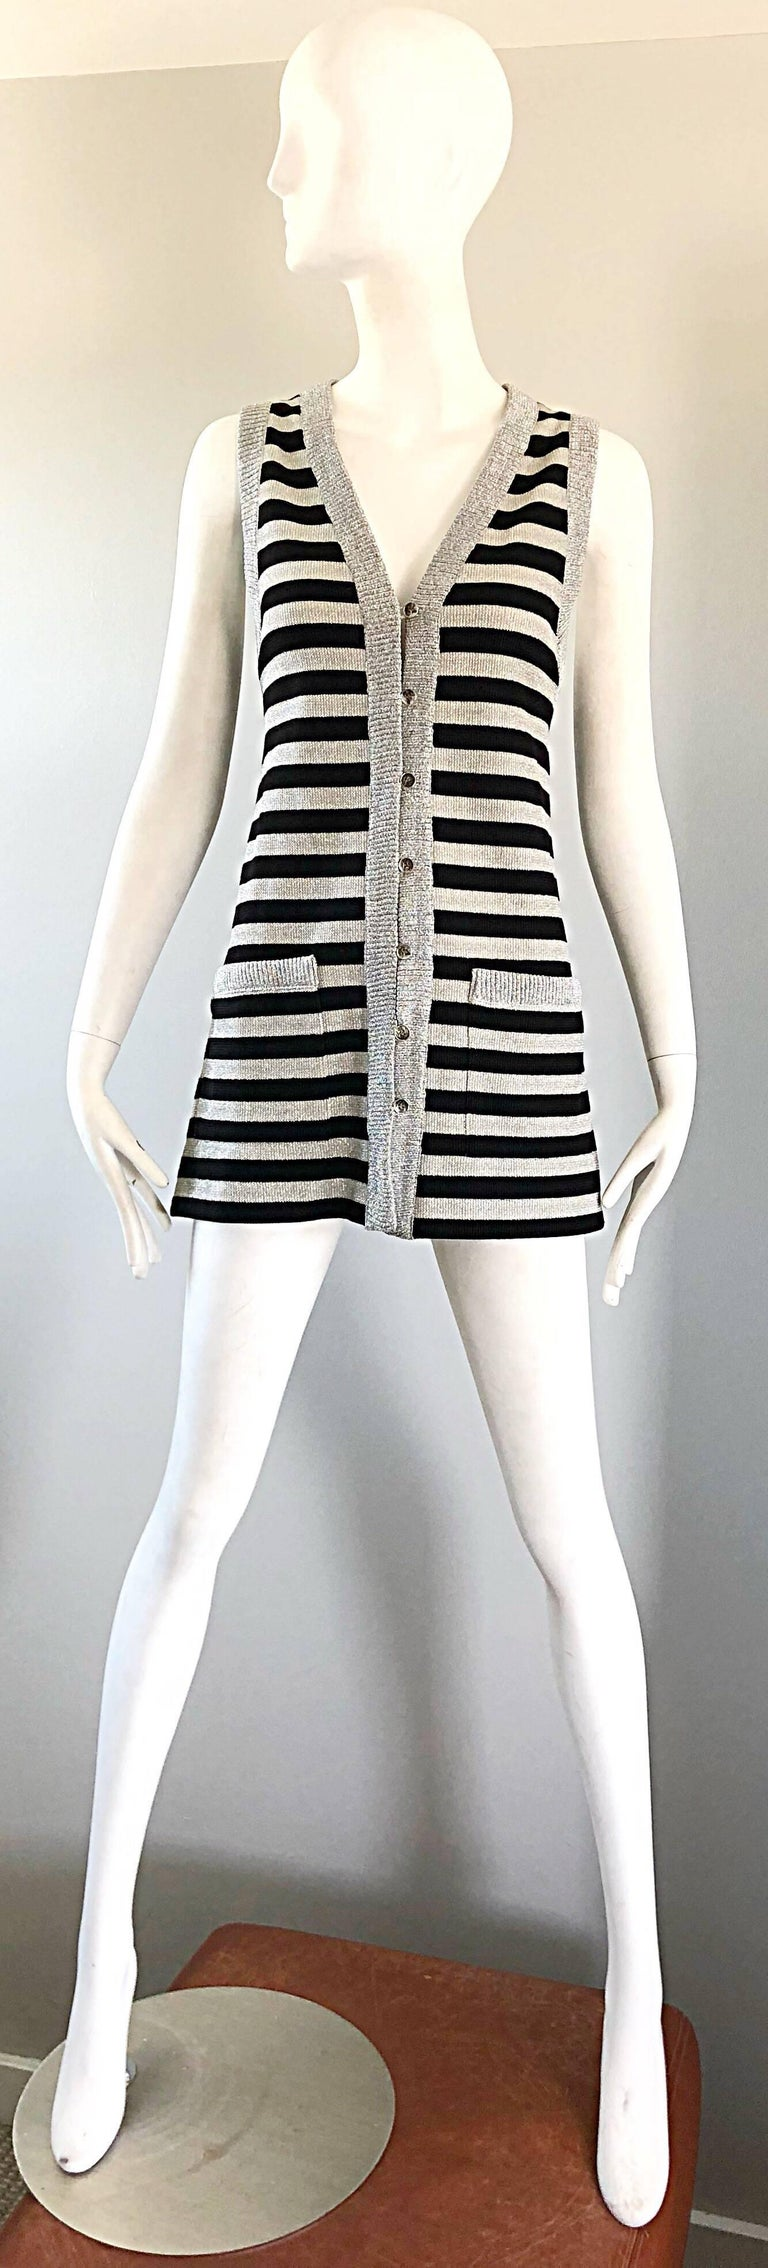 1970s Silver + Black Metallic Striped Sleeveless Vintage Vest Tunic / Mini Dress For Sale 11